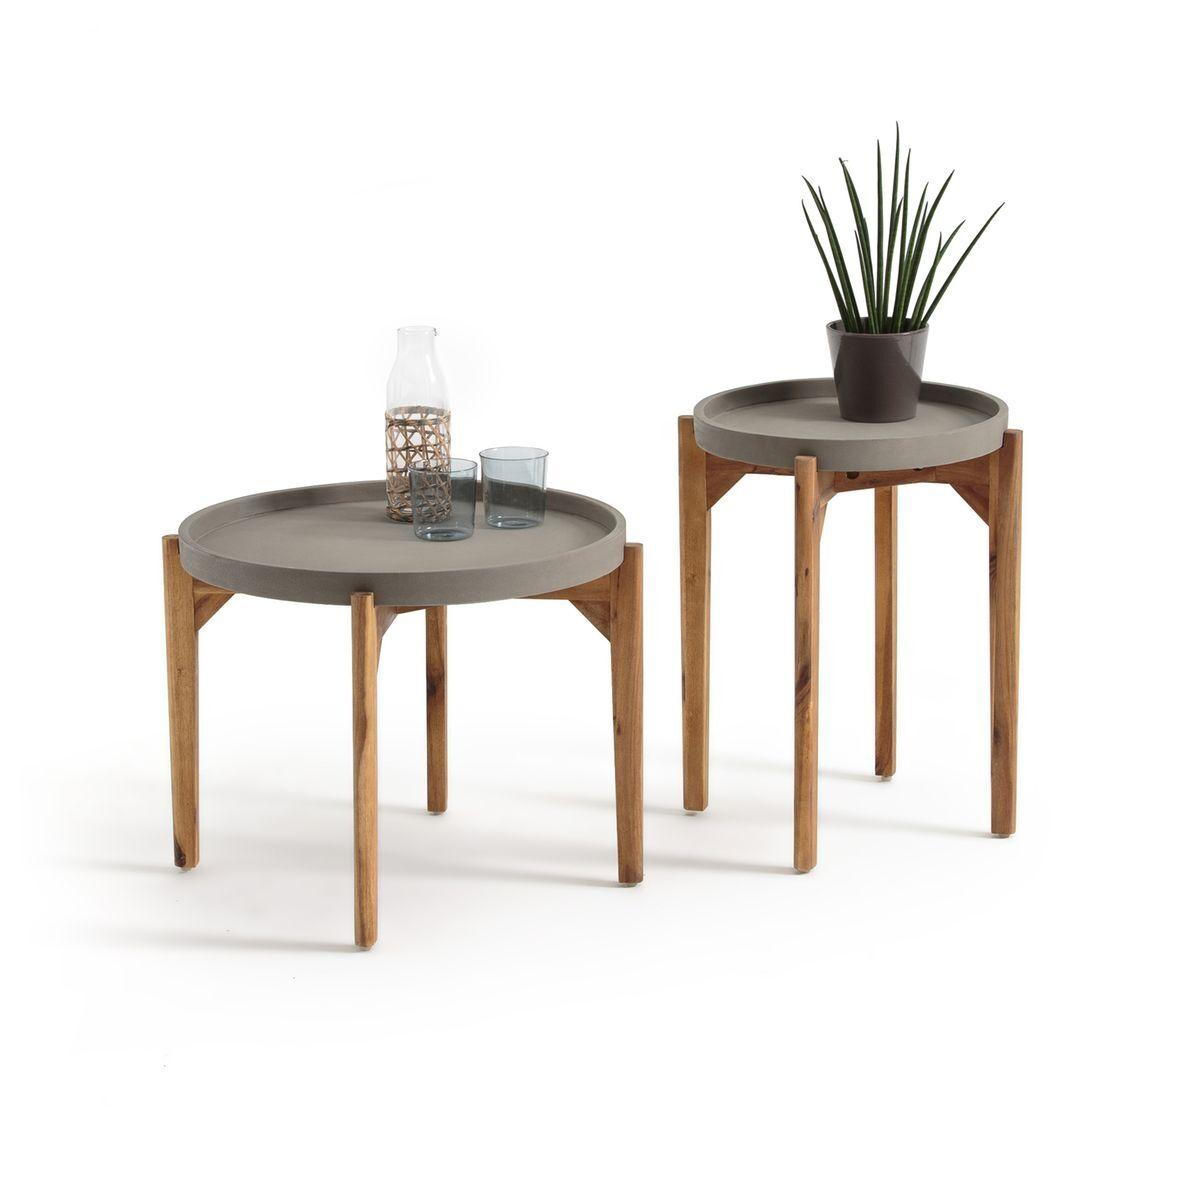 La Redoute Table basse ronde BANDIATTO (lot de 2) - LA REDOUTE INTERIEURS